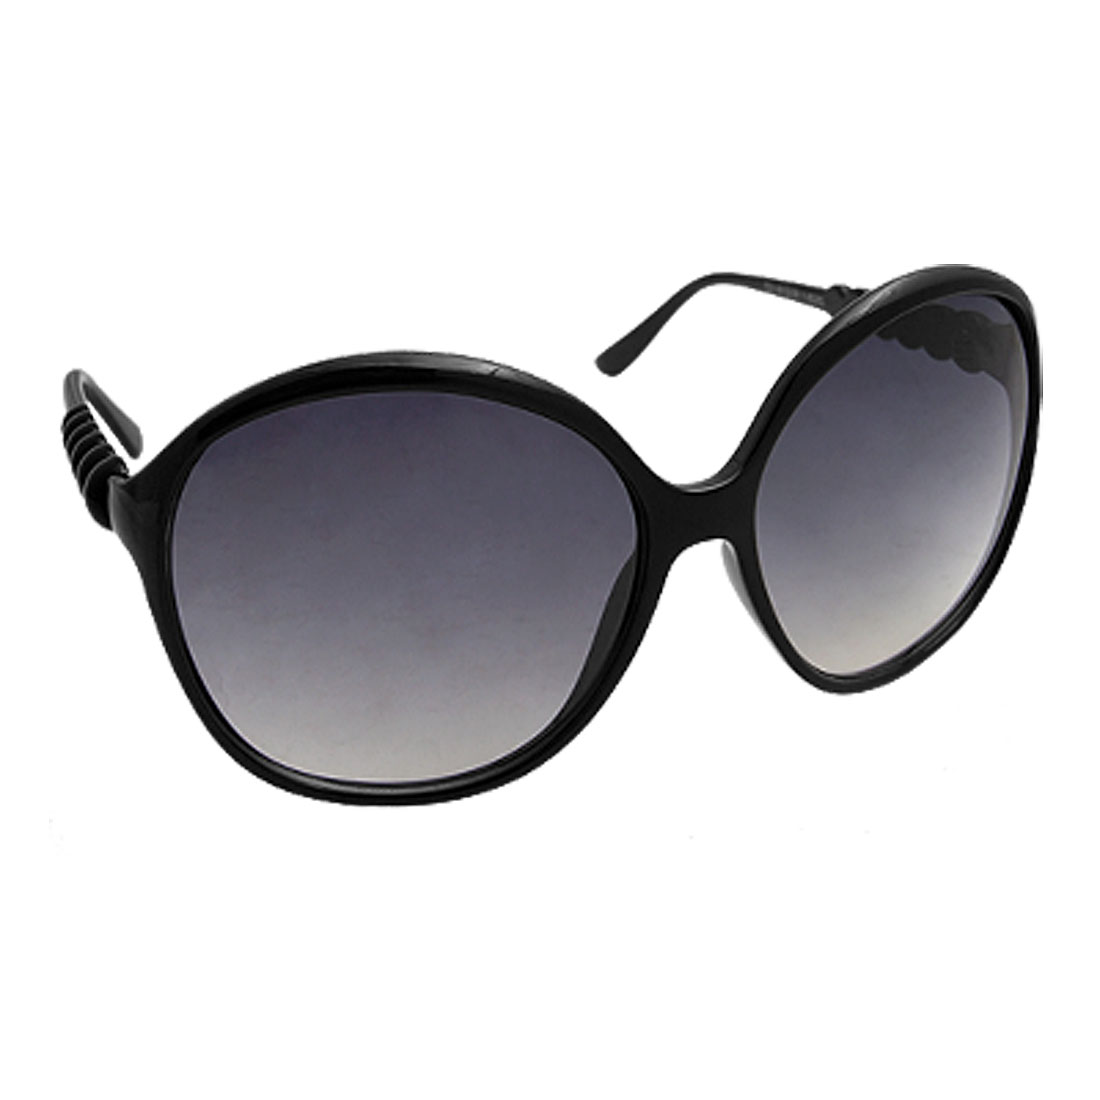 Black Frame Arms Sunglasses Eyewear for Women